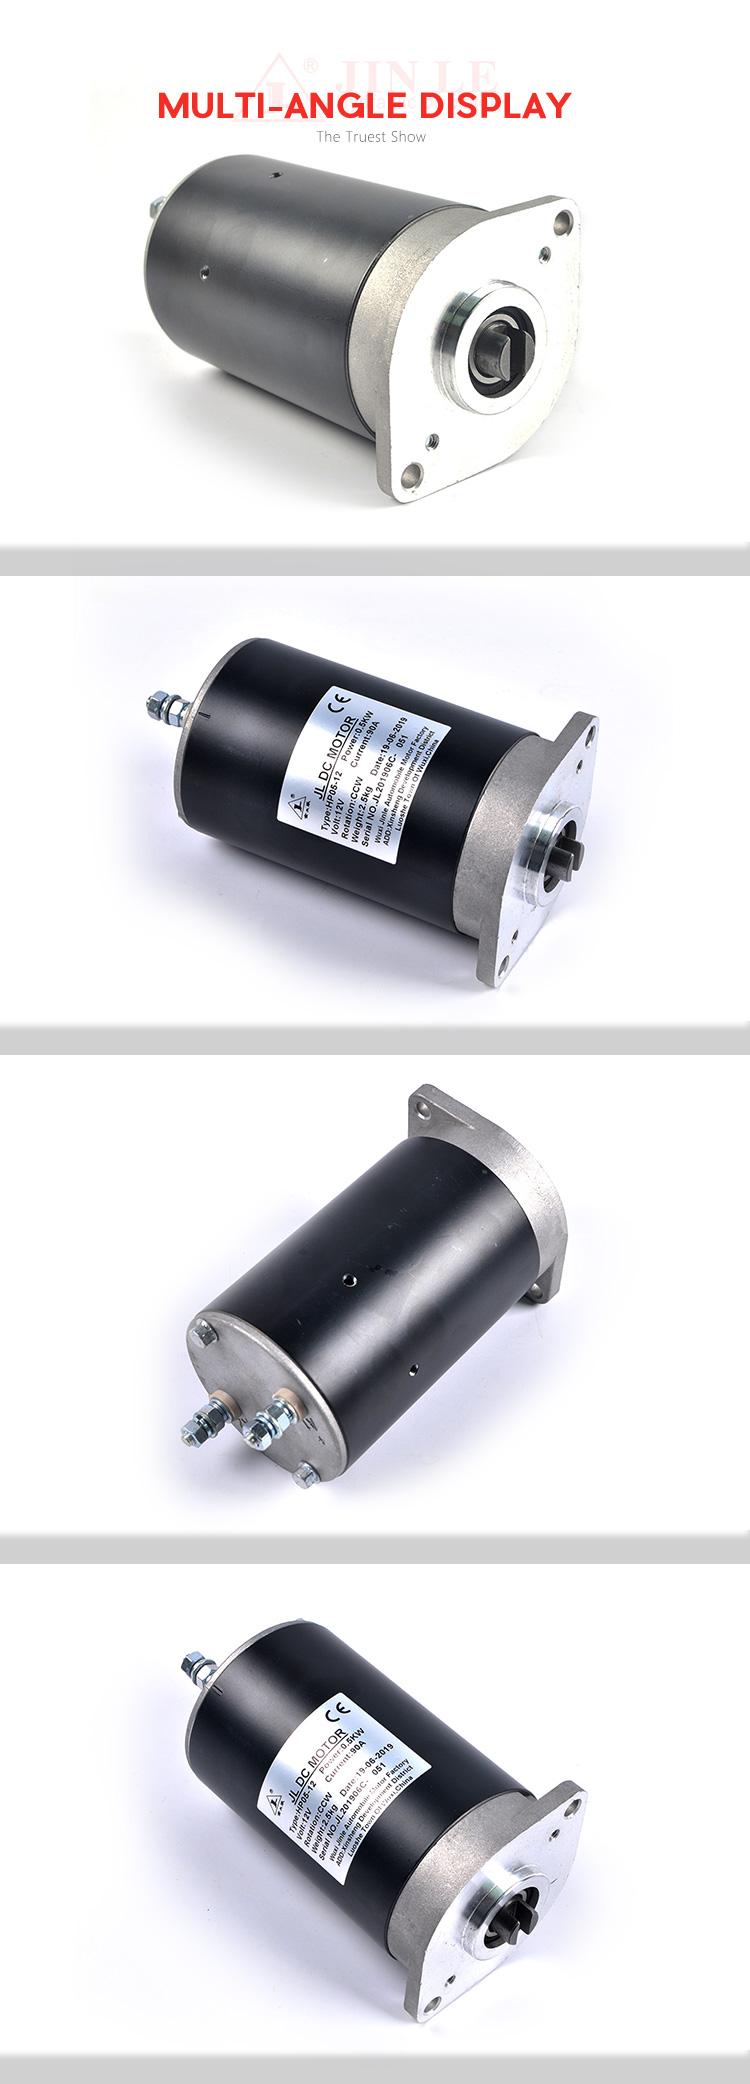 Alta Velocidade 12v 500w Permanent Magnet Dc Motor Hidráulico Buy ímã Permanente Do Motor Dc 12v 500w Dc Motor Motor De Corrente Contínua De Alta Velocidade Product On Alibaba Com